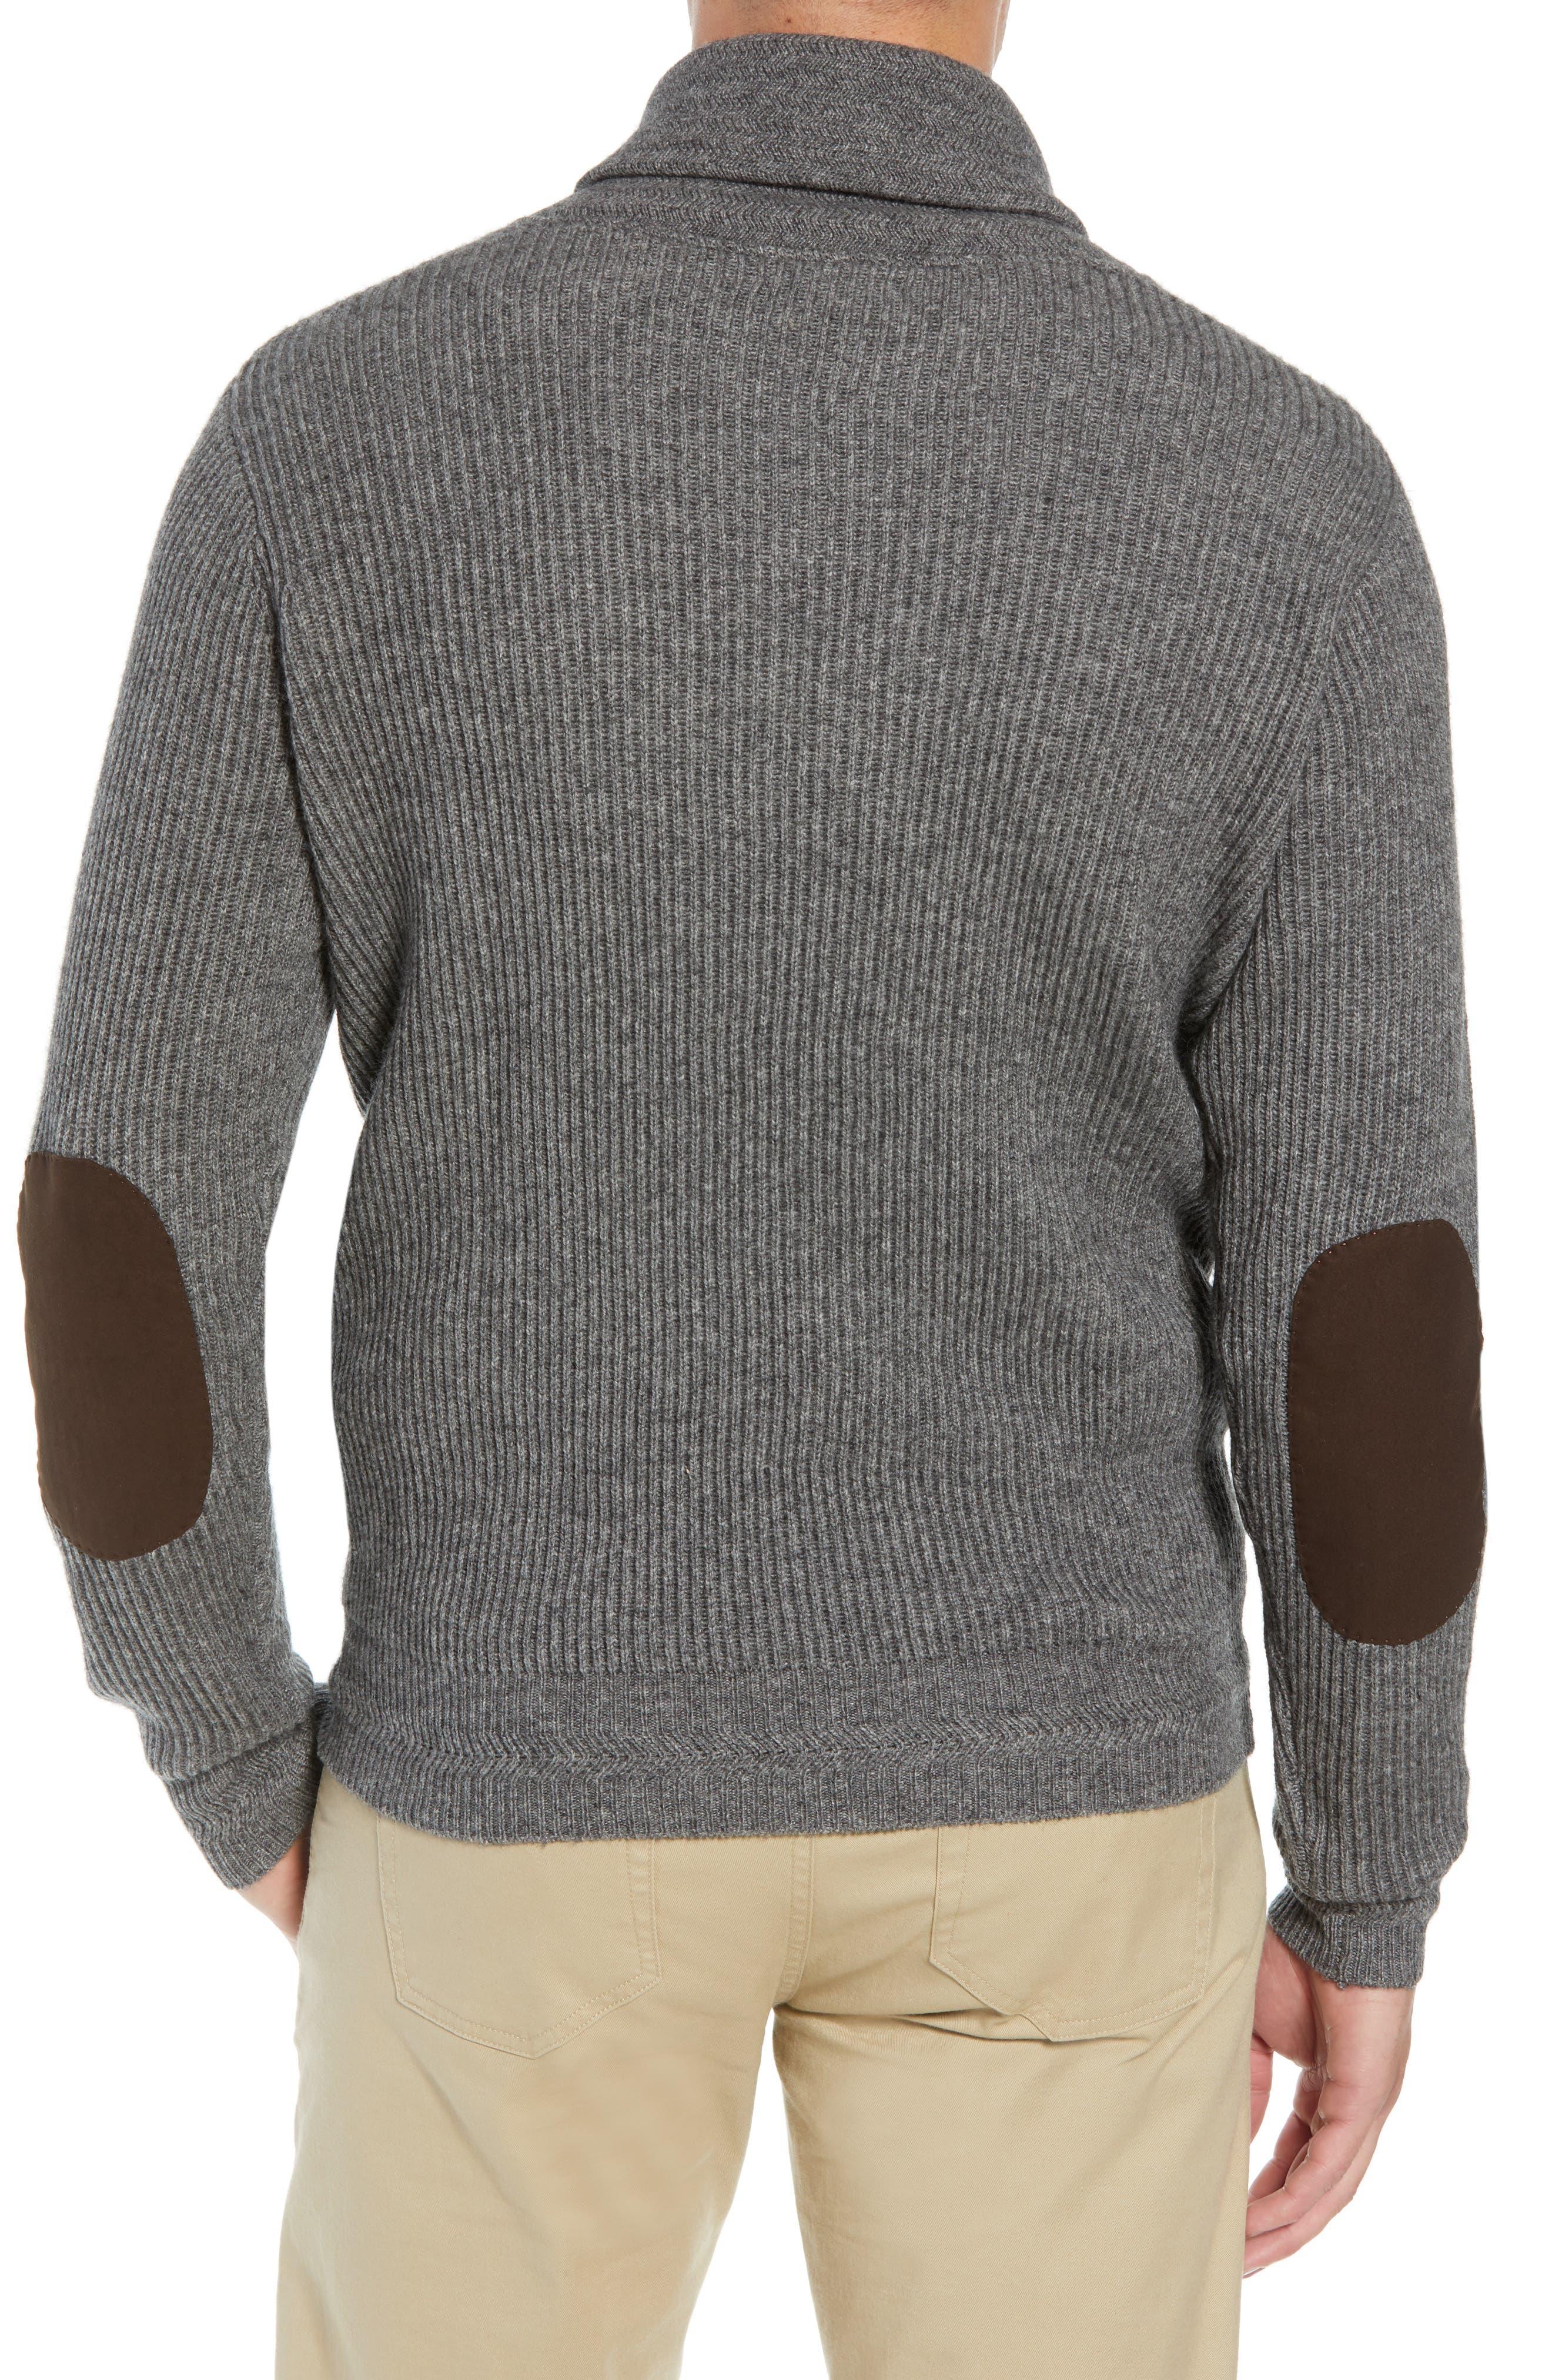 Mountainside Wool Blend Shawl Sweater,                             Alternate thumbnail 2, color,                             025